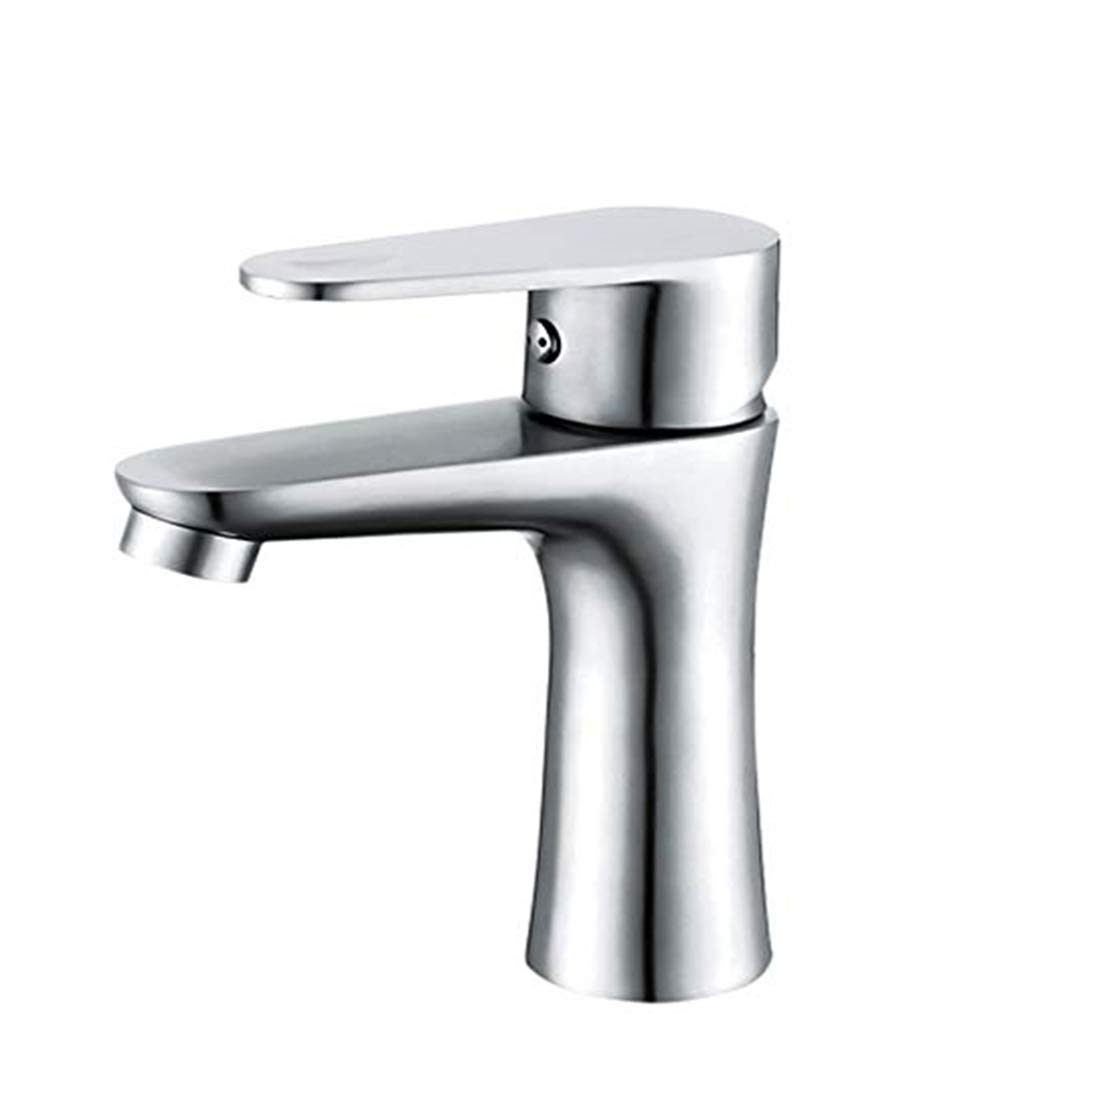 Edelstahlhahn weiße Chrombadhahnbasin_304 Stainless Steel Sink Hot And Cold Bathroom Basin